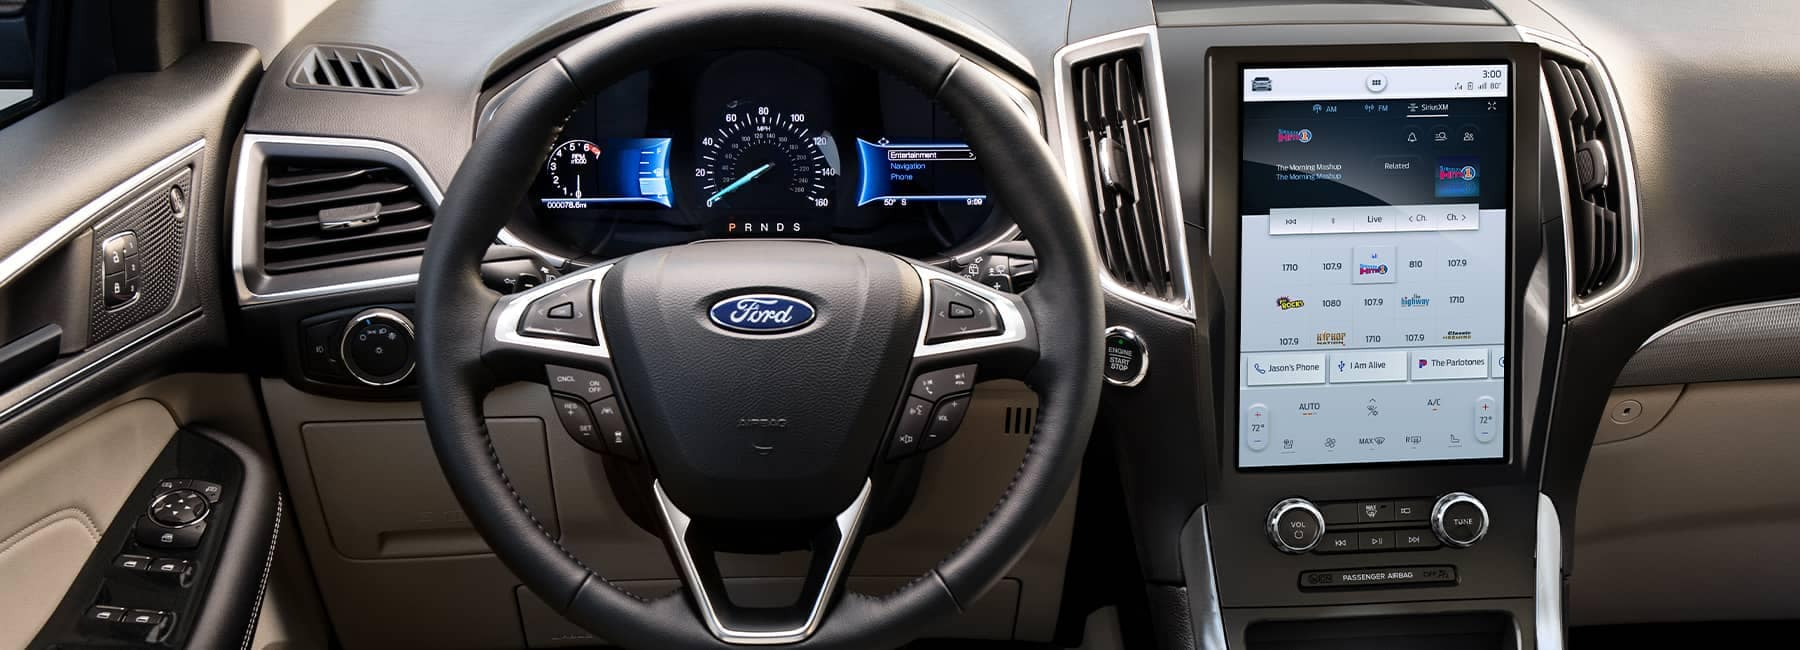 2021 Ford Edge interior dashboard